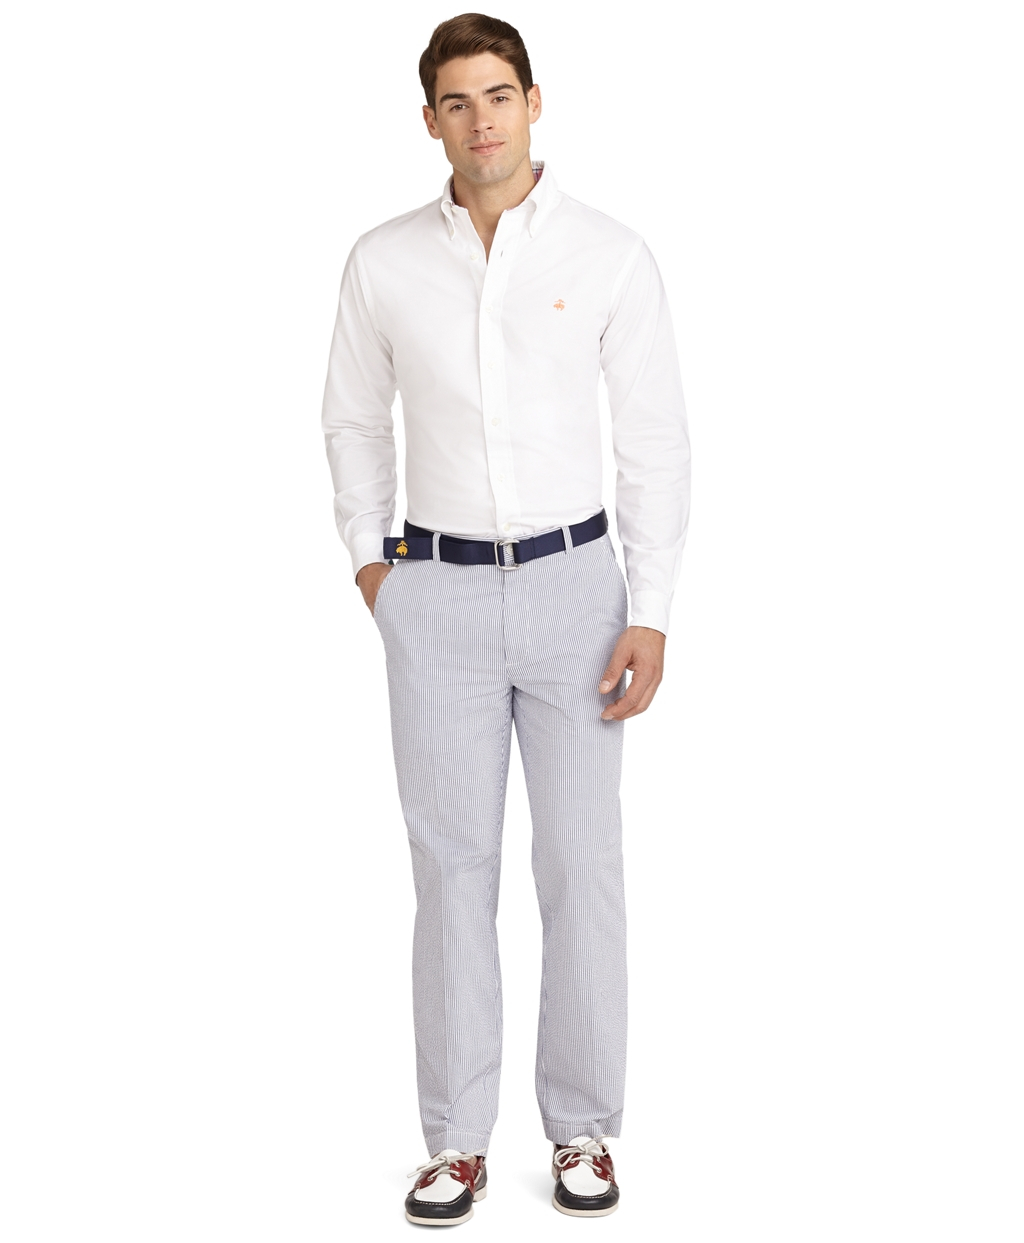 Boat Shoes White Pants